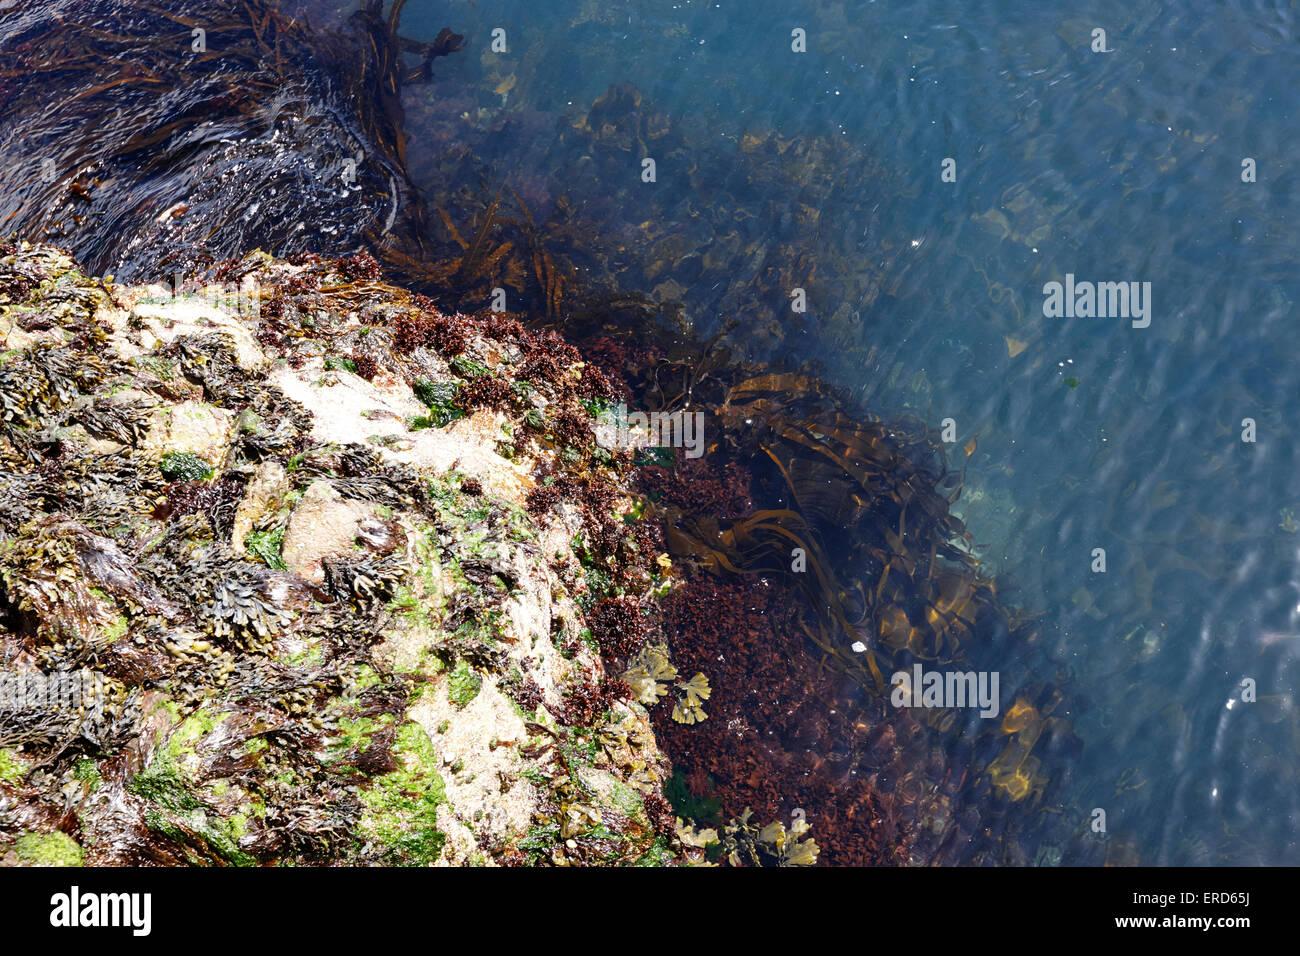 various seaweeds and algae growing on rocks at limerick point Cushendall County Antrim Northern Ireland UK - Stock Image